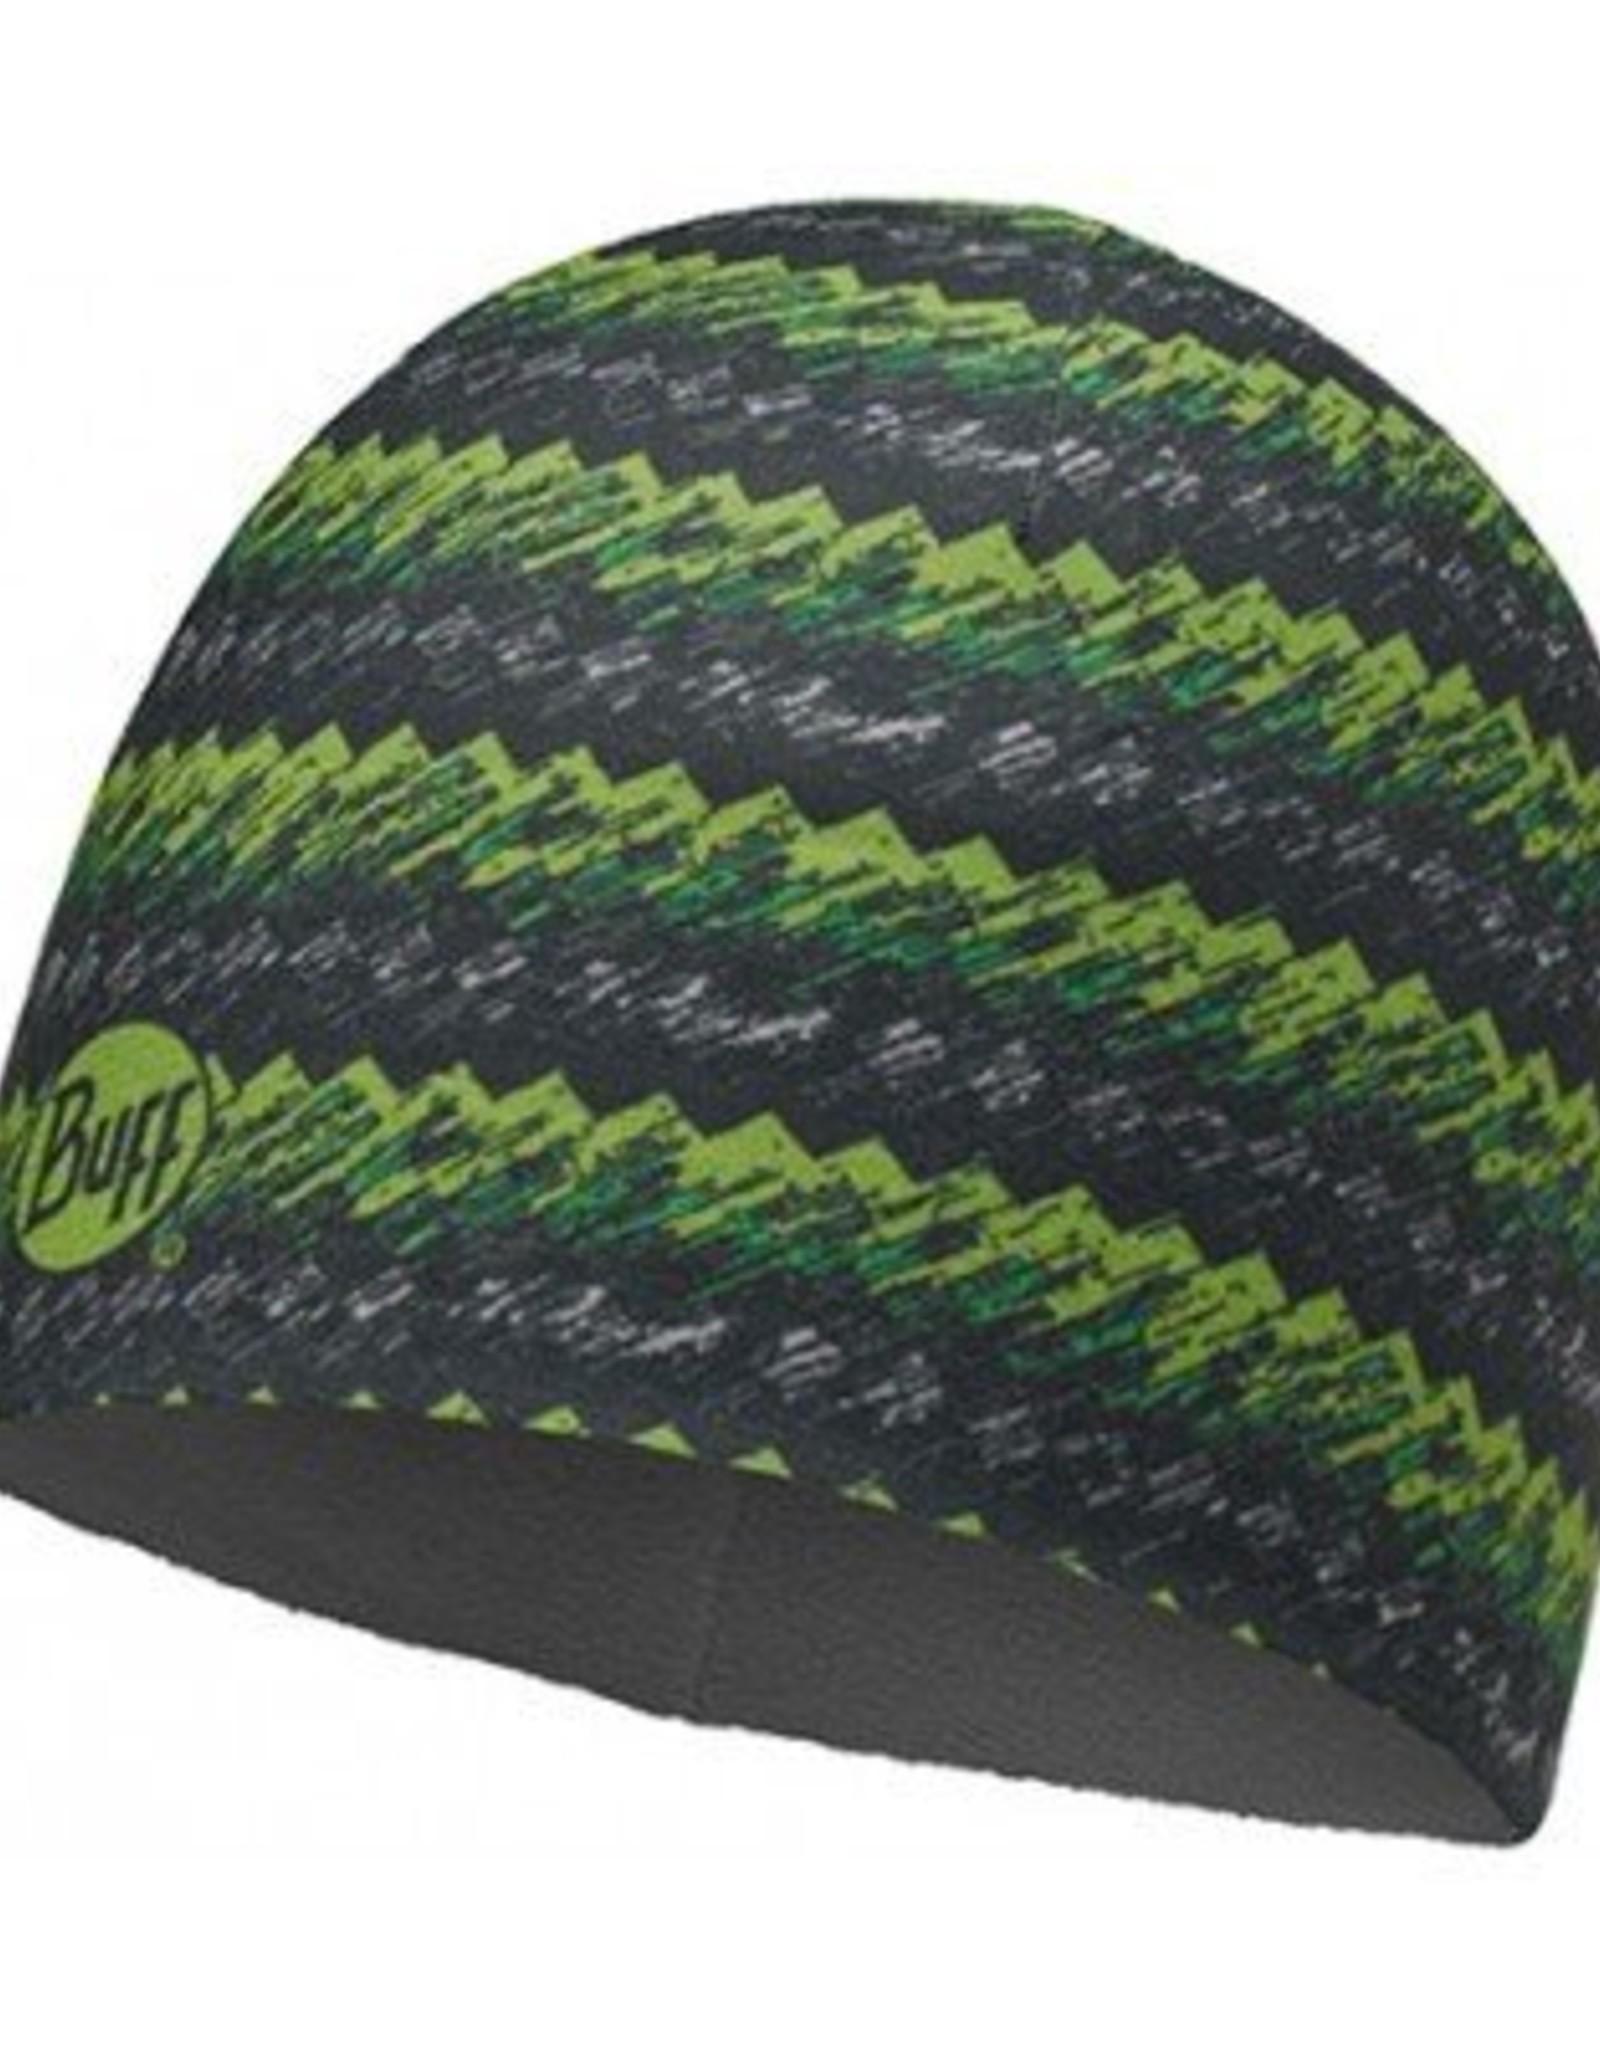 BUFF VON GREEN- MICRO POLAR HAT